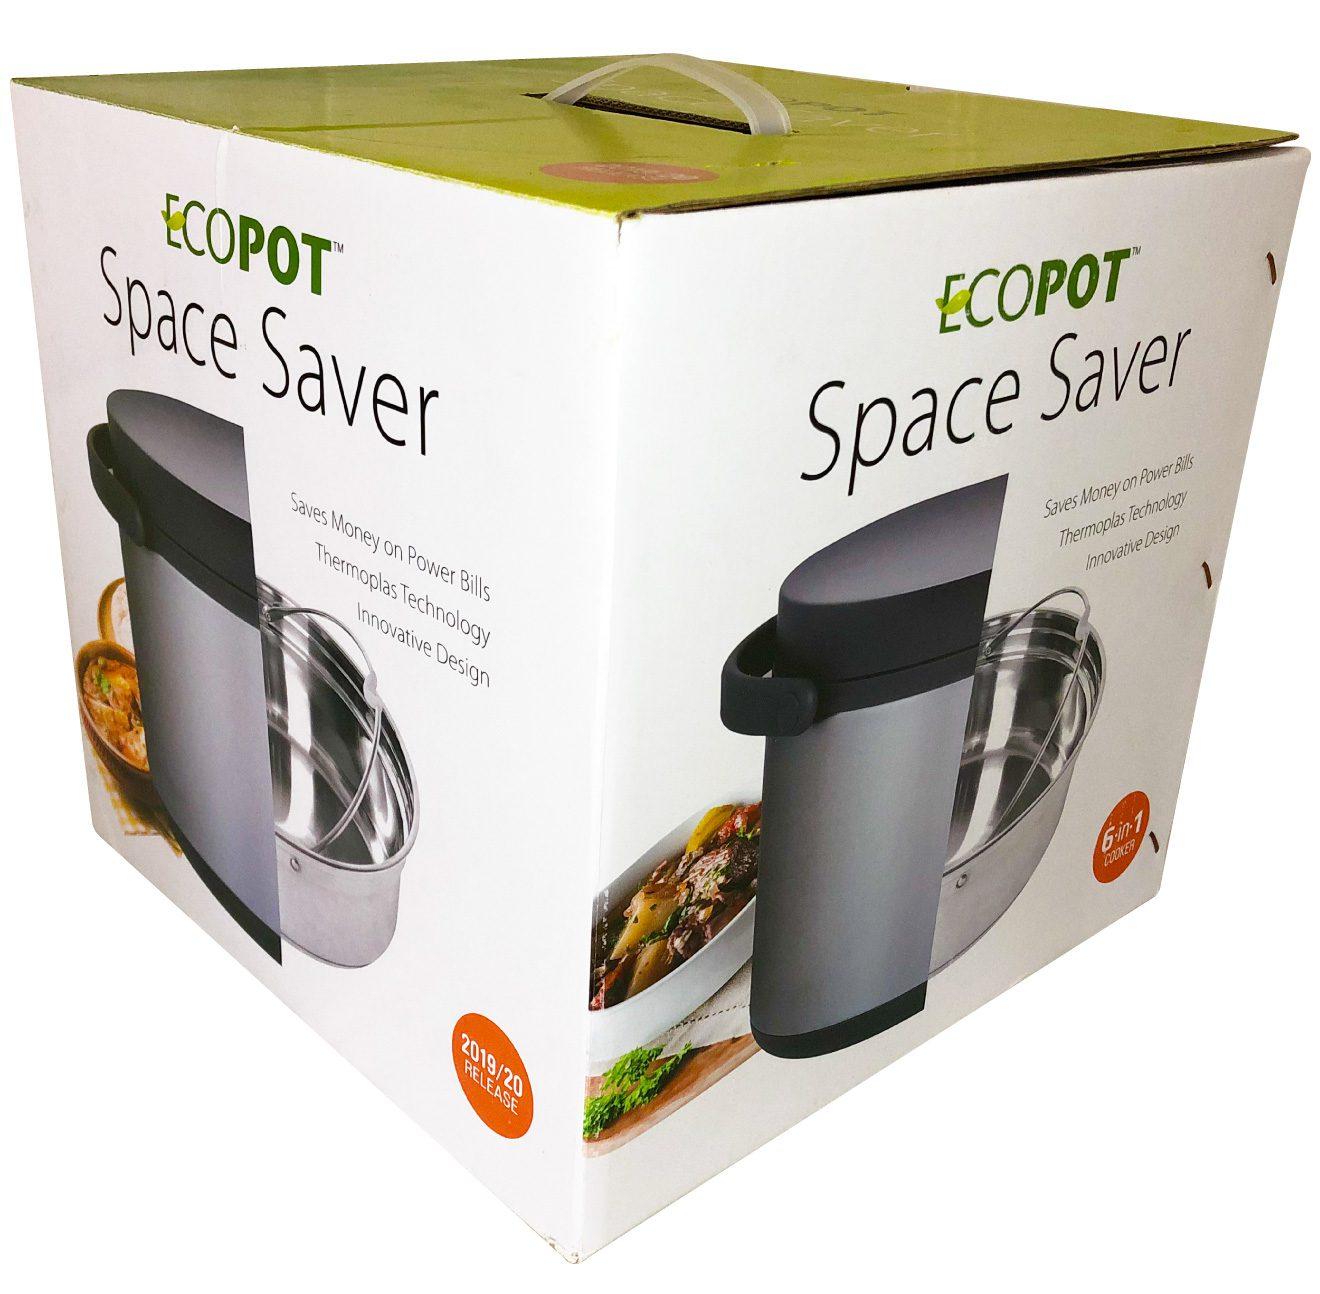 Ecopot Spacesaver